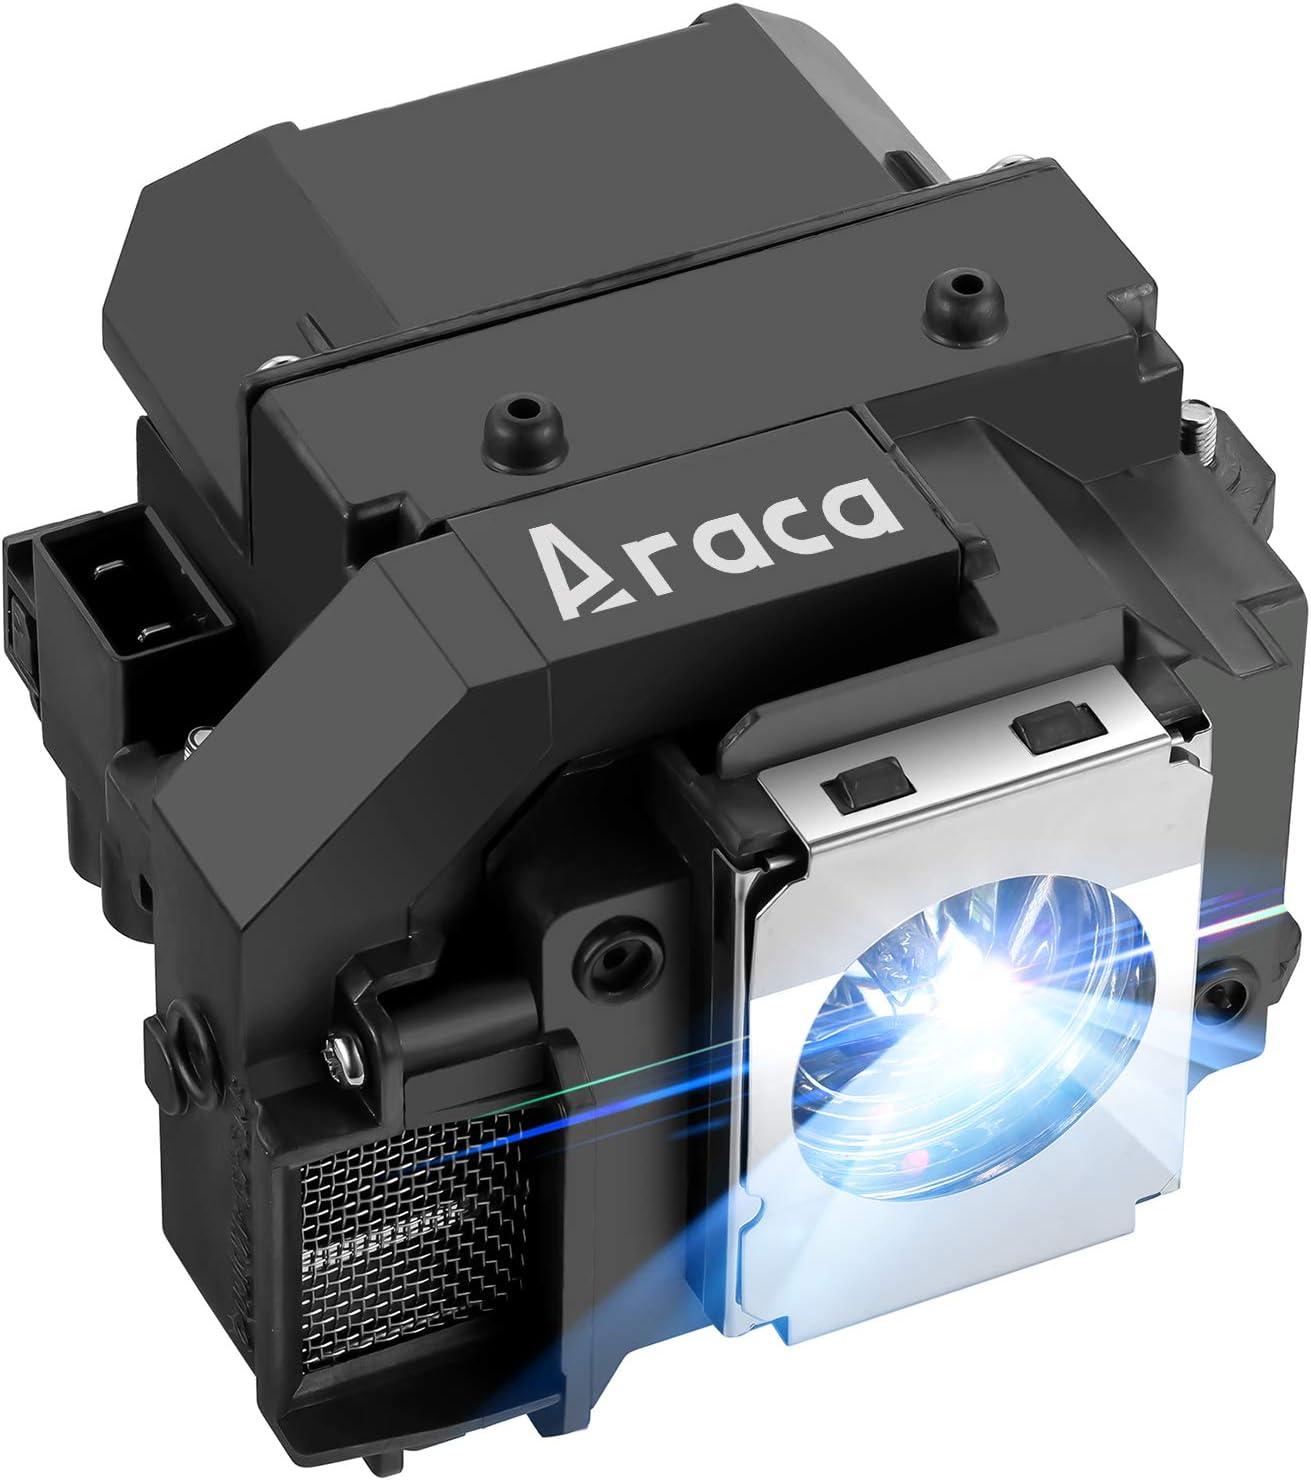 Araca ELPLP54 /ELPLP55 Replacement Projector Lamp with Housing for Epson EX71 EX51 H331A EX31 H309A H310C H328A H328B PowerLite S8+ S7 705HD H335A EB-W8D PowerLite Presenter Lamp